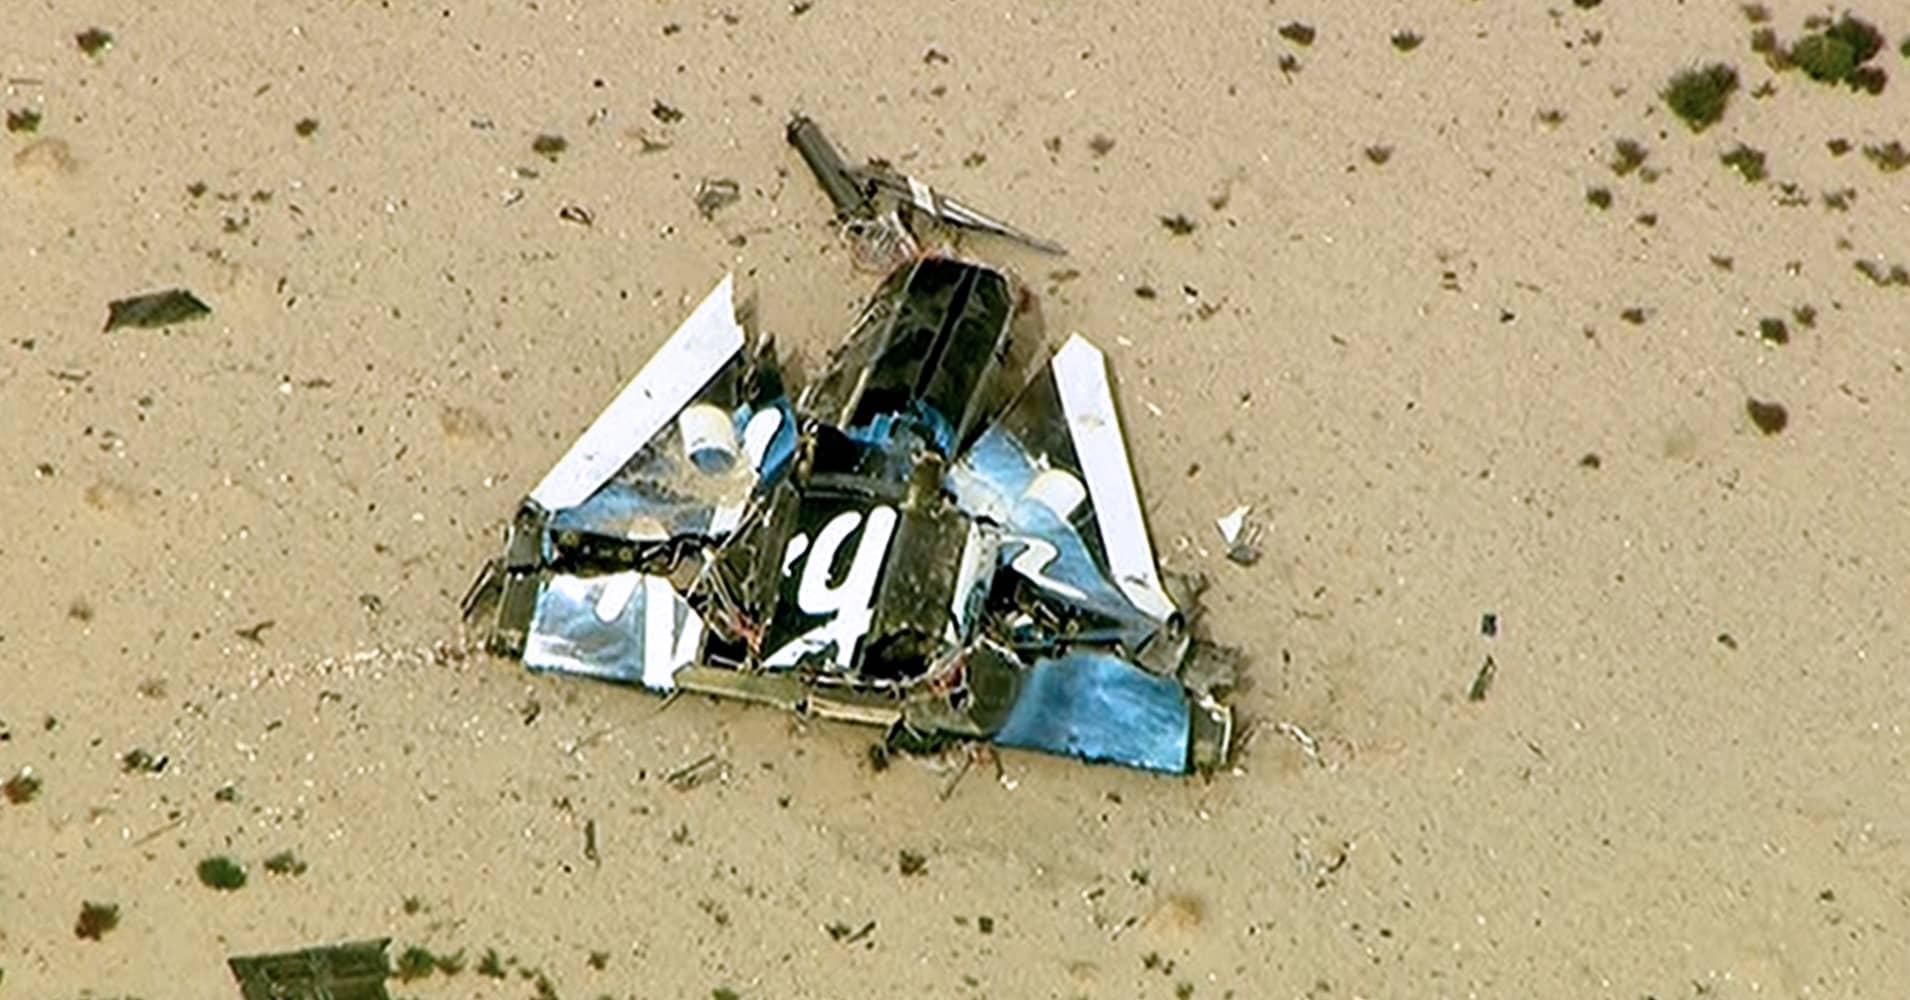 spacecraft crash - photo #34